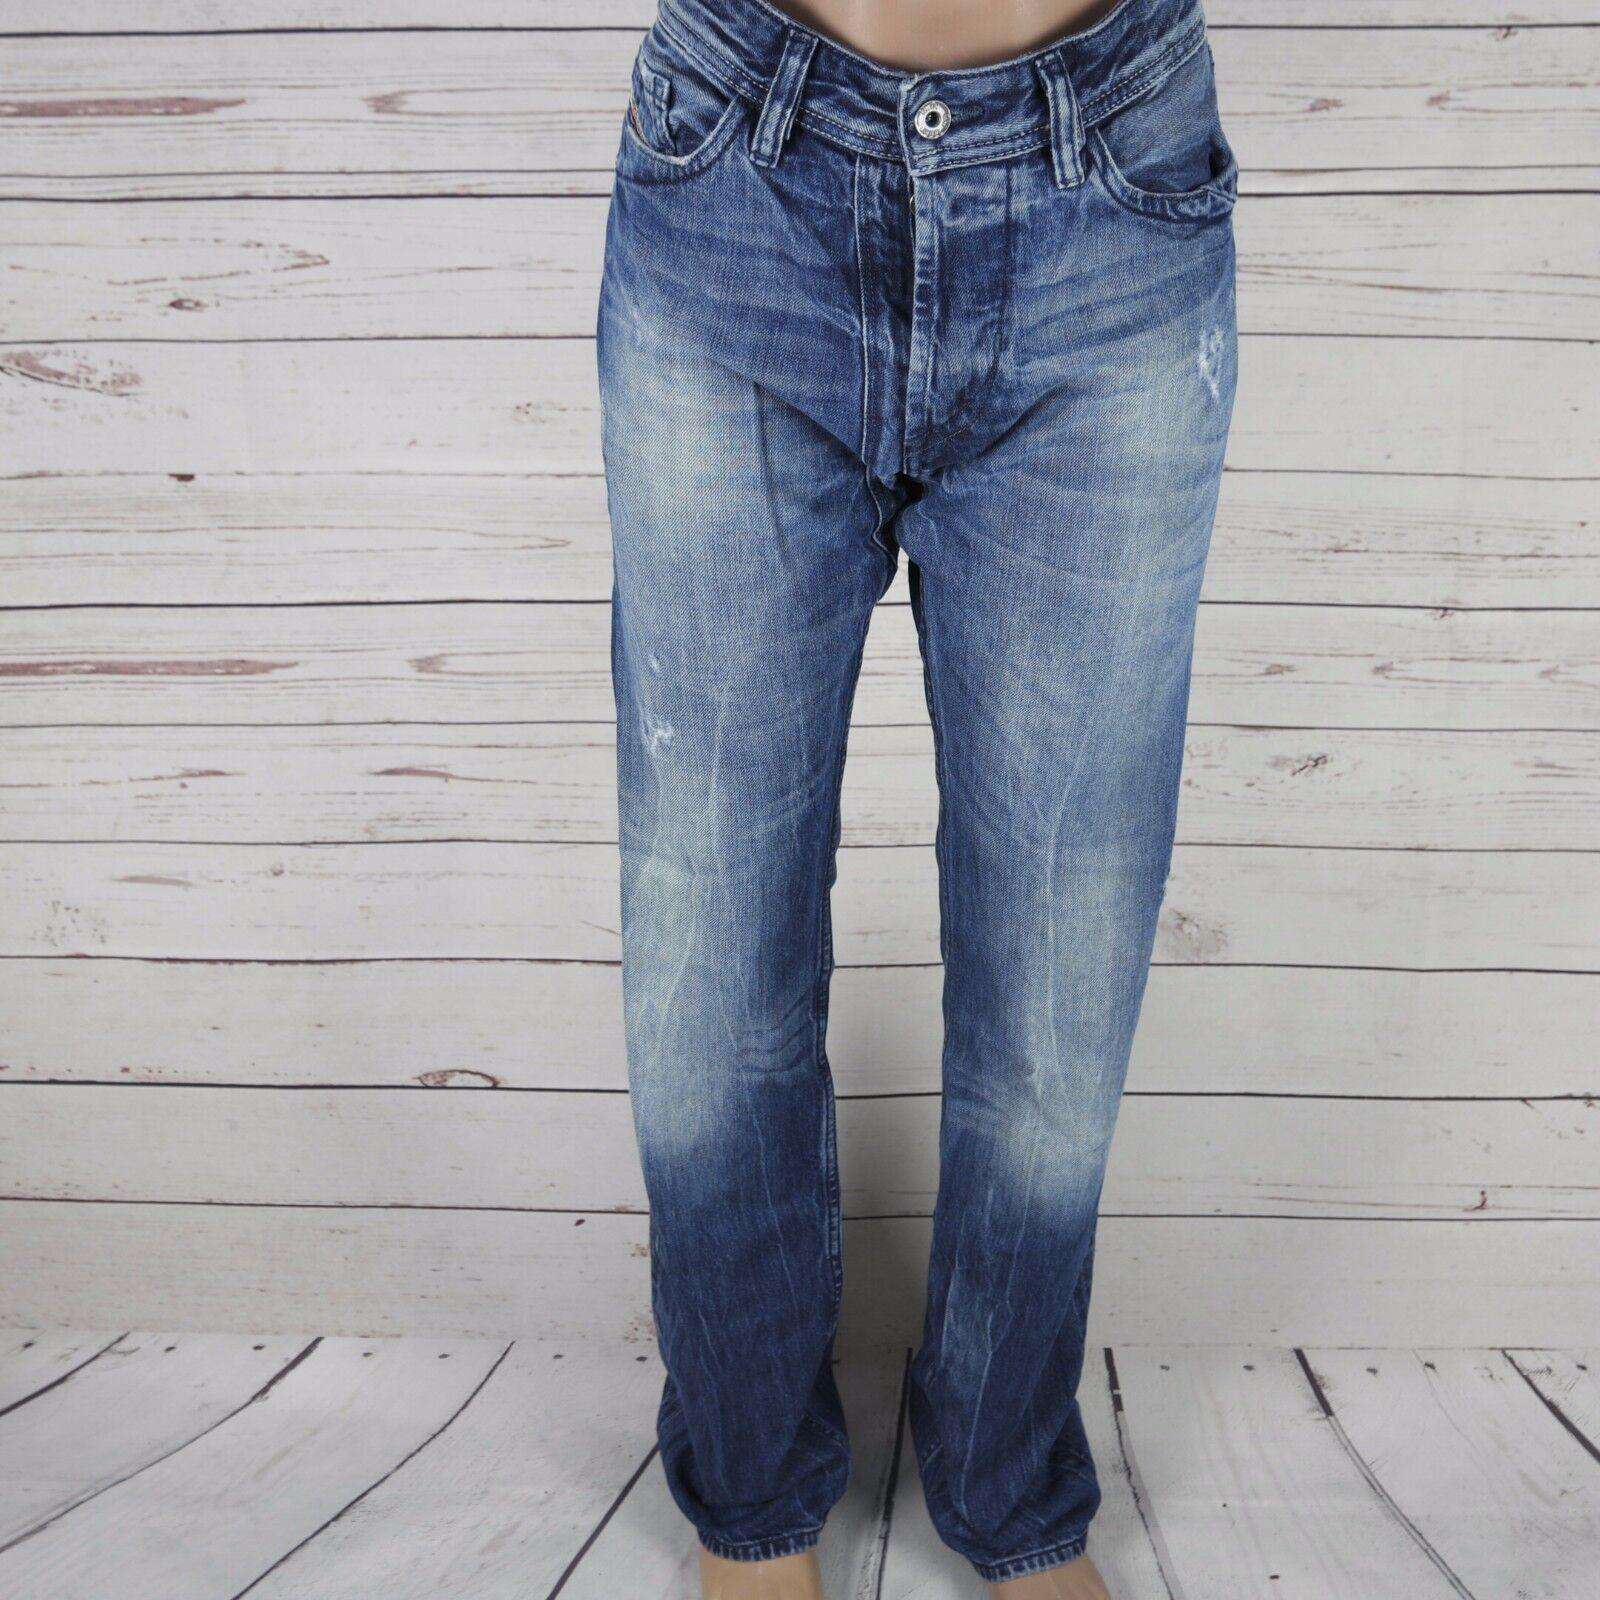 DIESEL Jeans uomo Taglia w29-l34 MODEL mennit